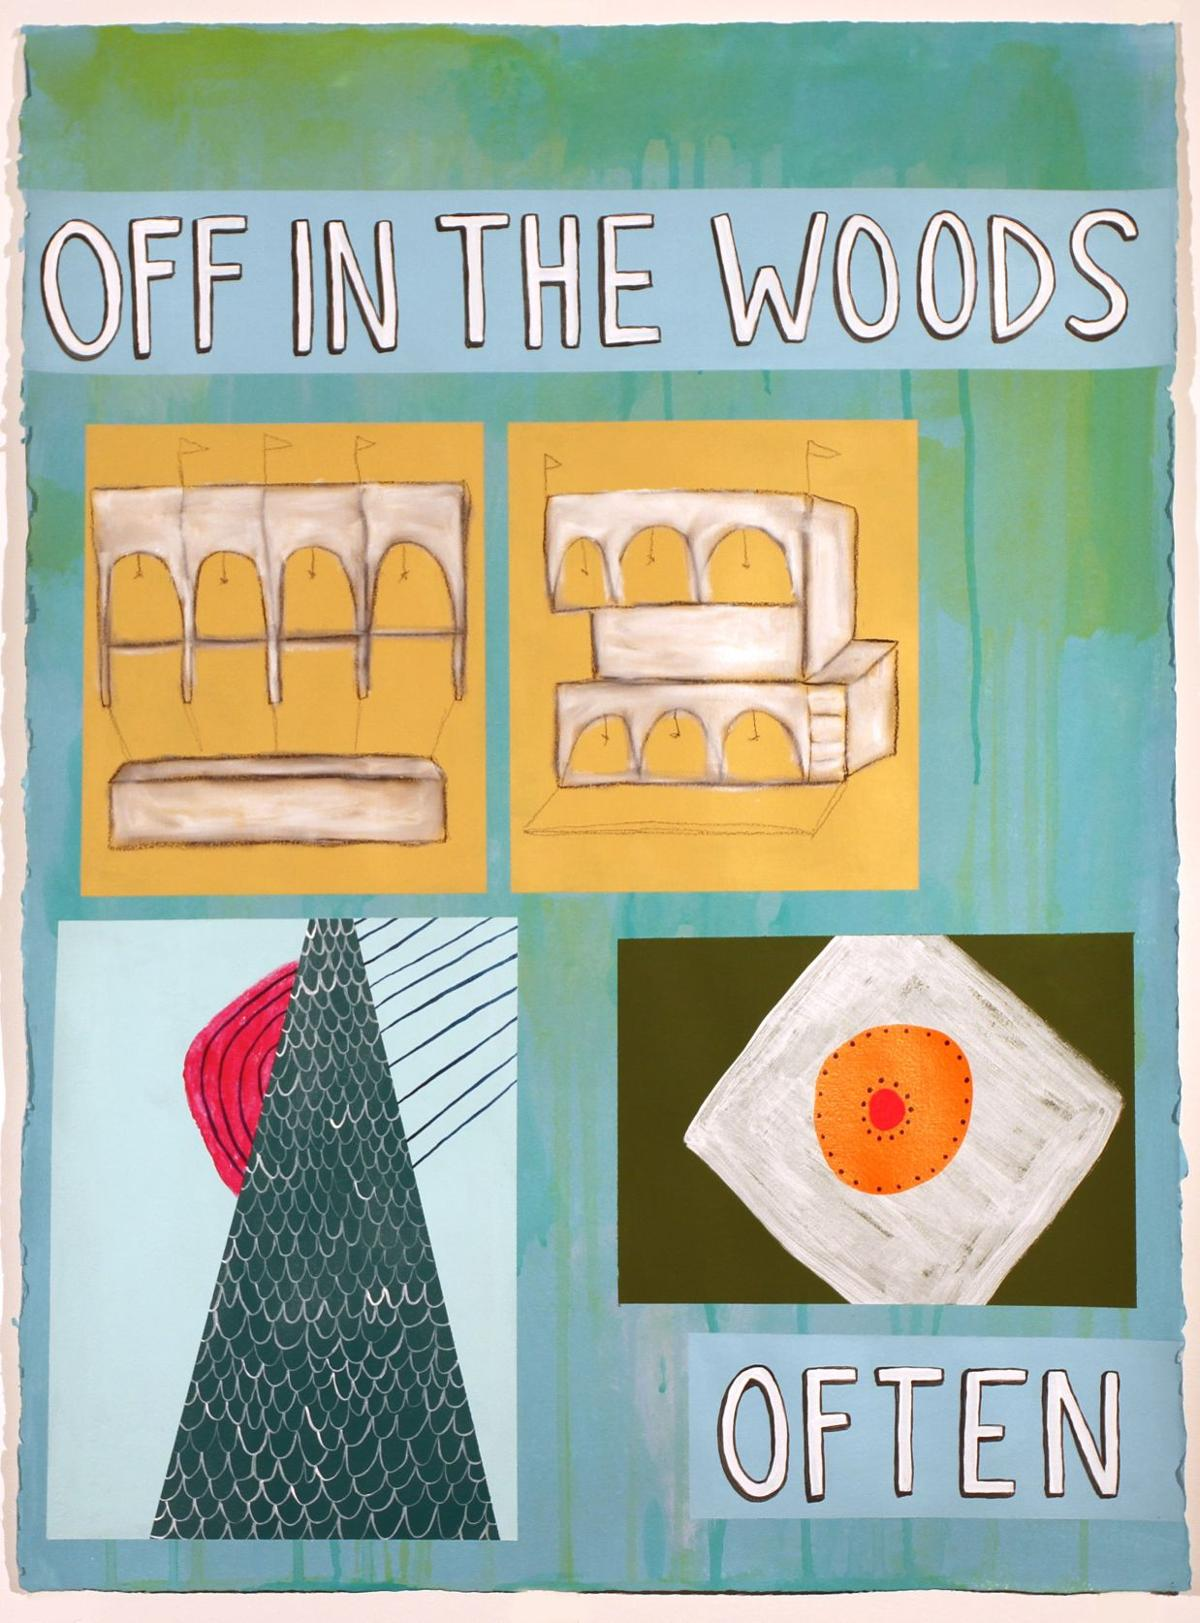 'Off in the Woods Often'